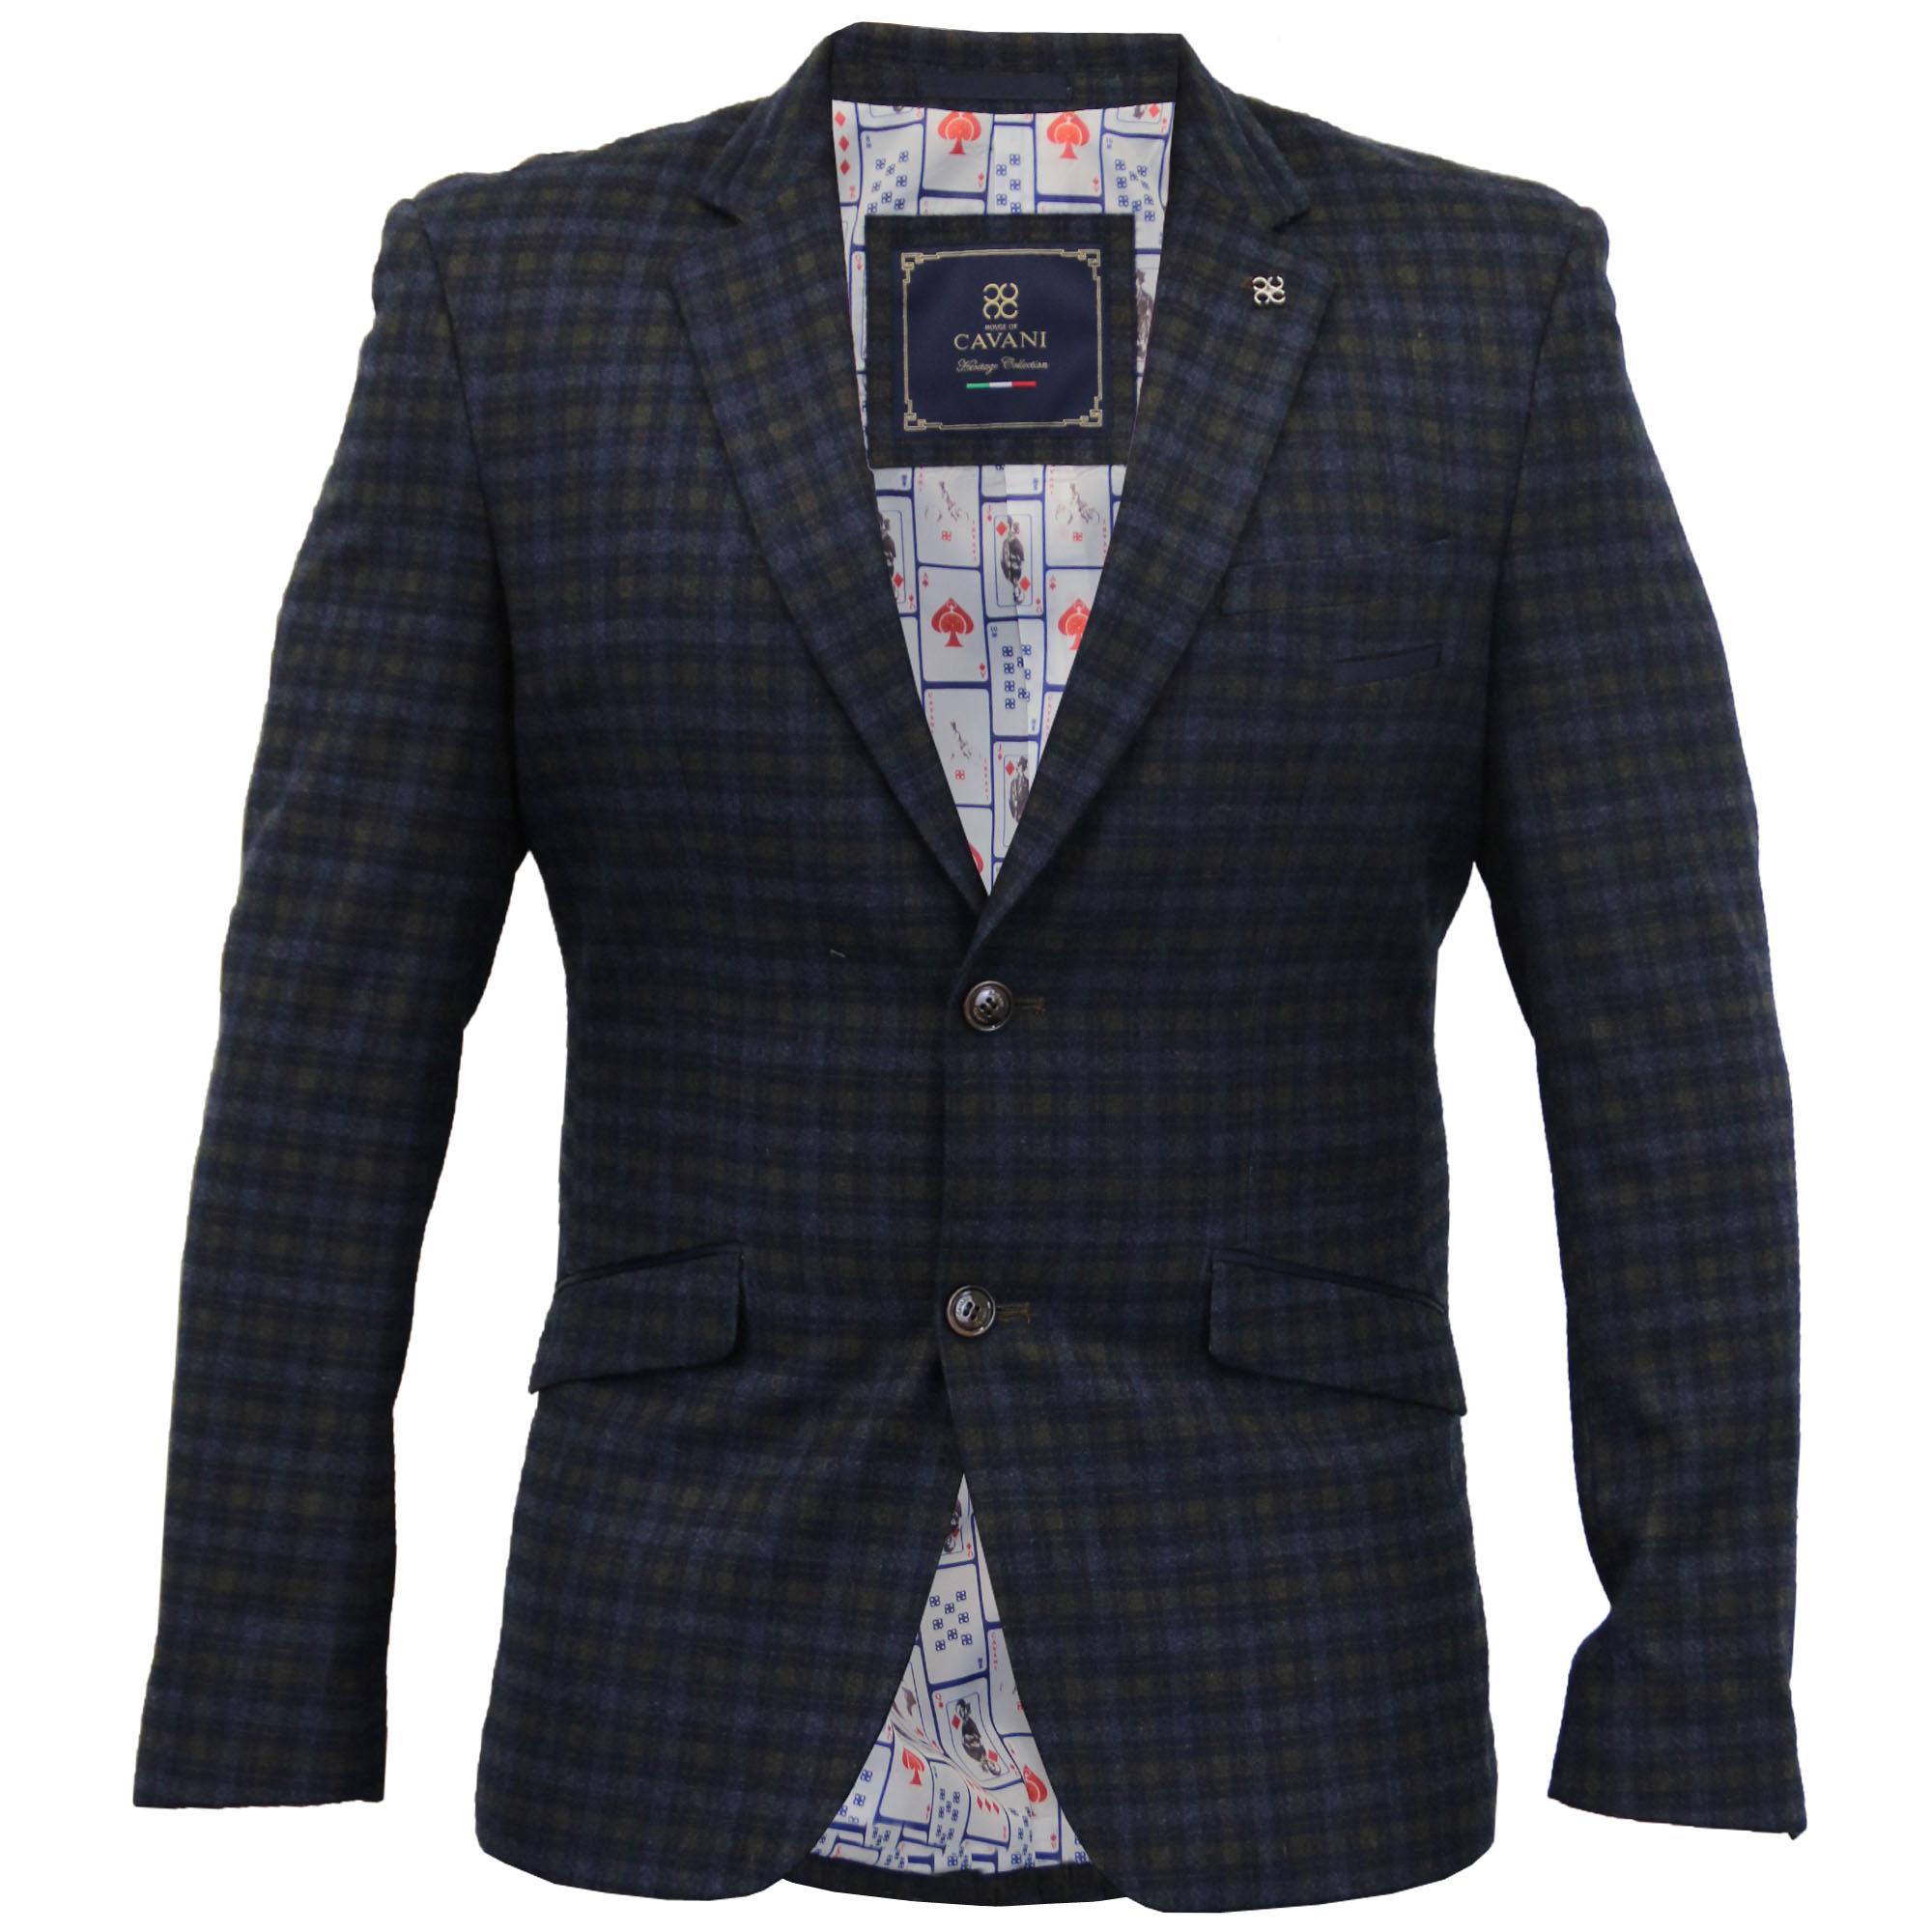 Blazers Jackets Mens: Mens Blazer Cavani Coat Dinner Suit Slim Fit Jacket Tartan